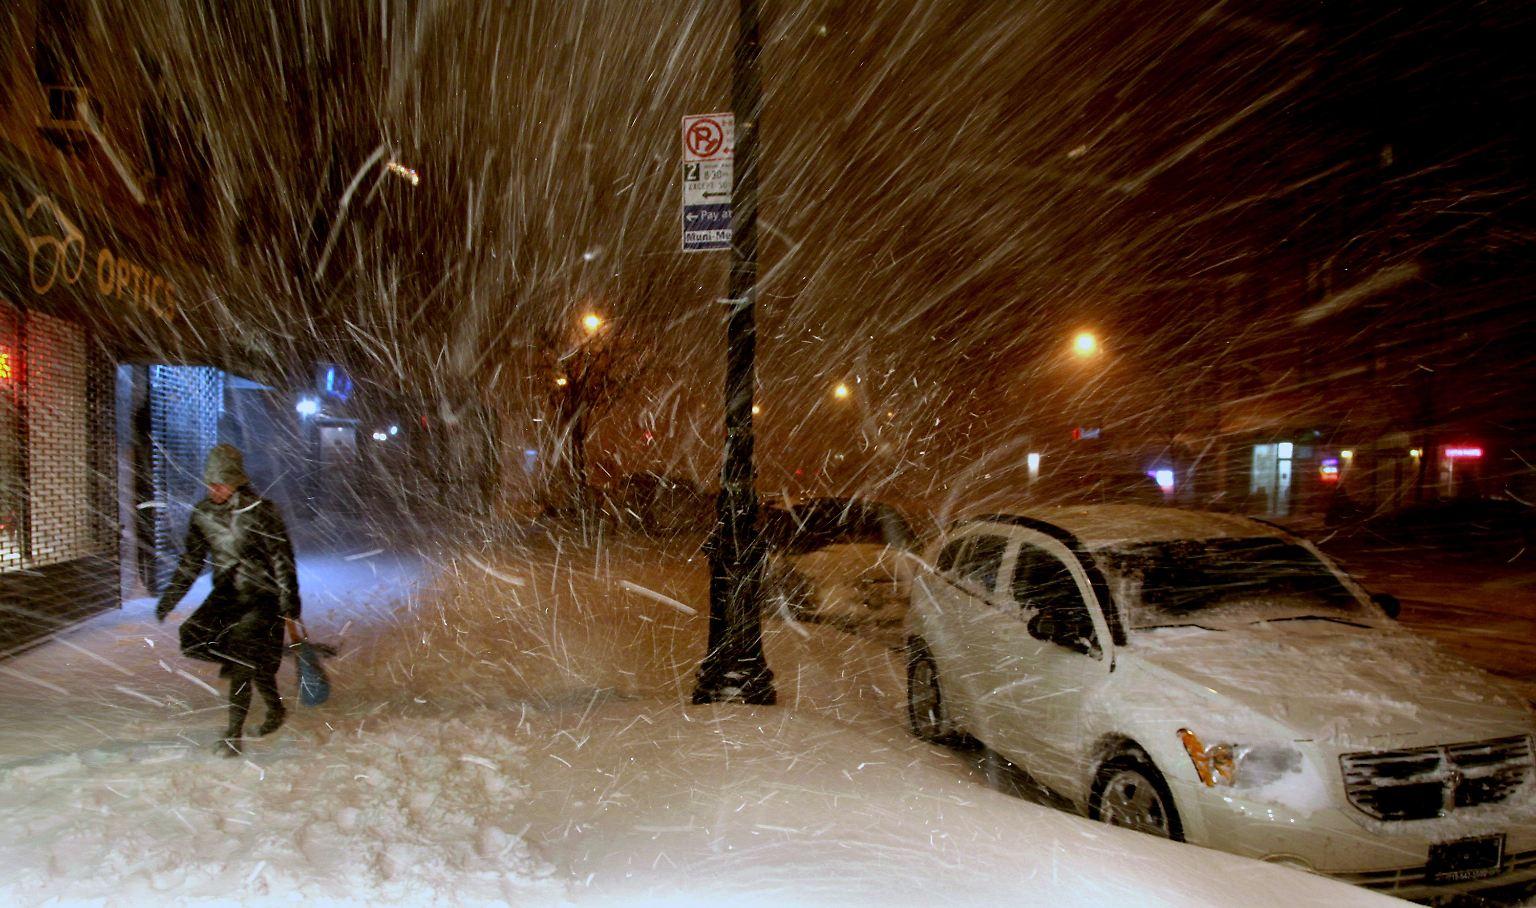 APTOPIX_Winter_Weather_NYCR101.jpg3448925055278001829.jpg